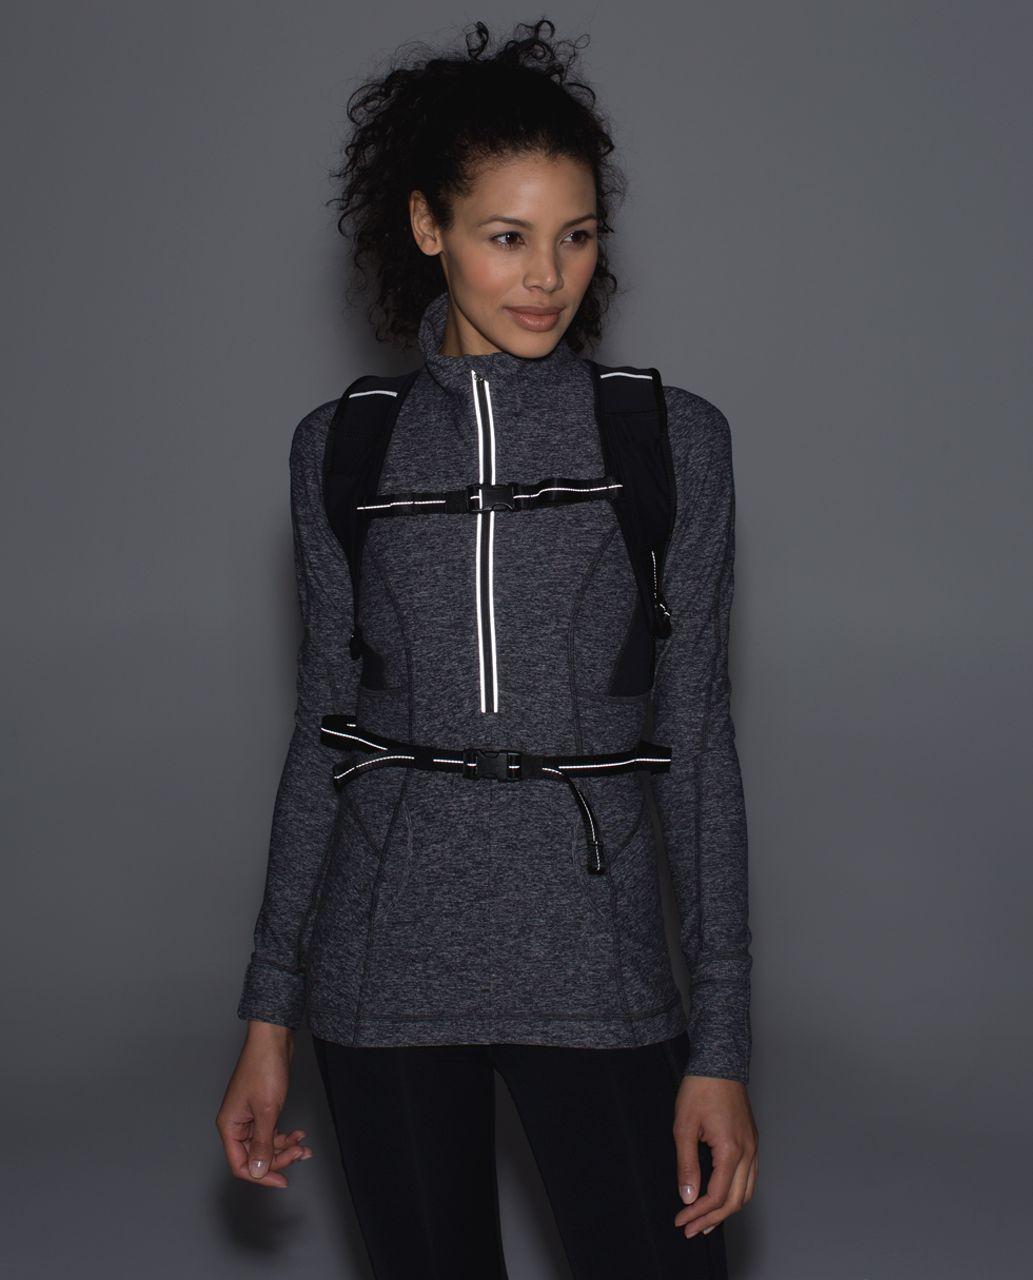 Lululemon Run All Day Backpack - Oversized Buffalo Check Almost Blue Black / Black